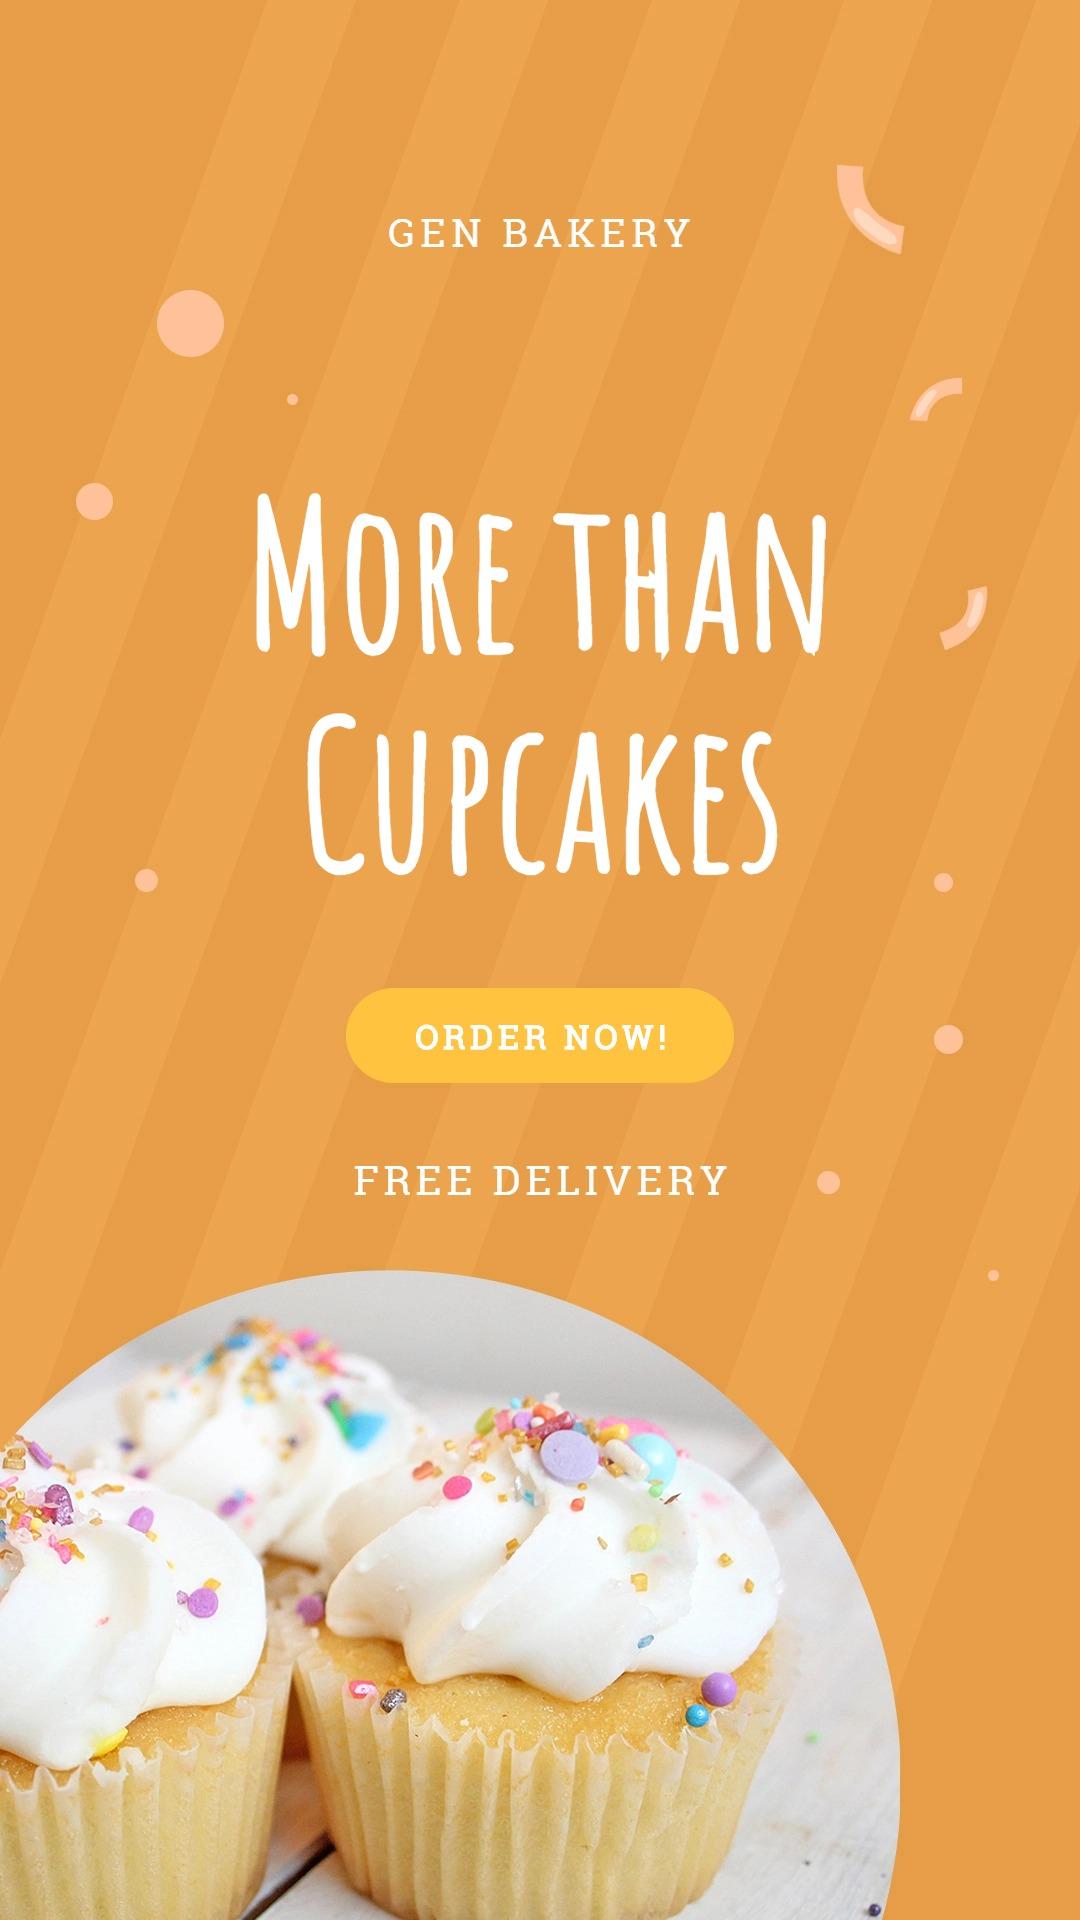 Cupcake Bakery Instagram Story Template